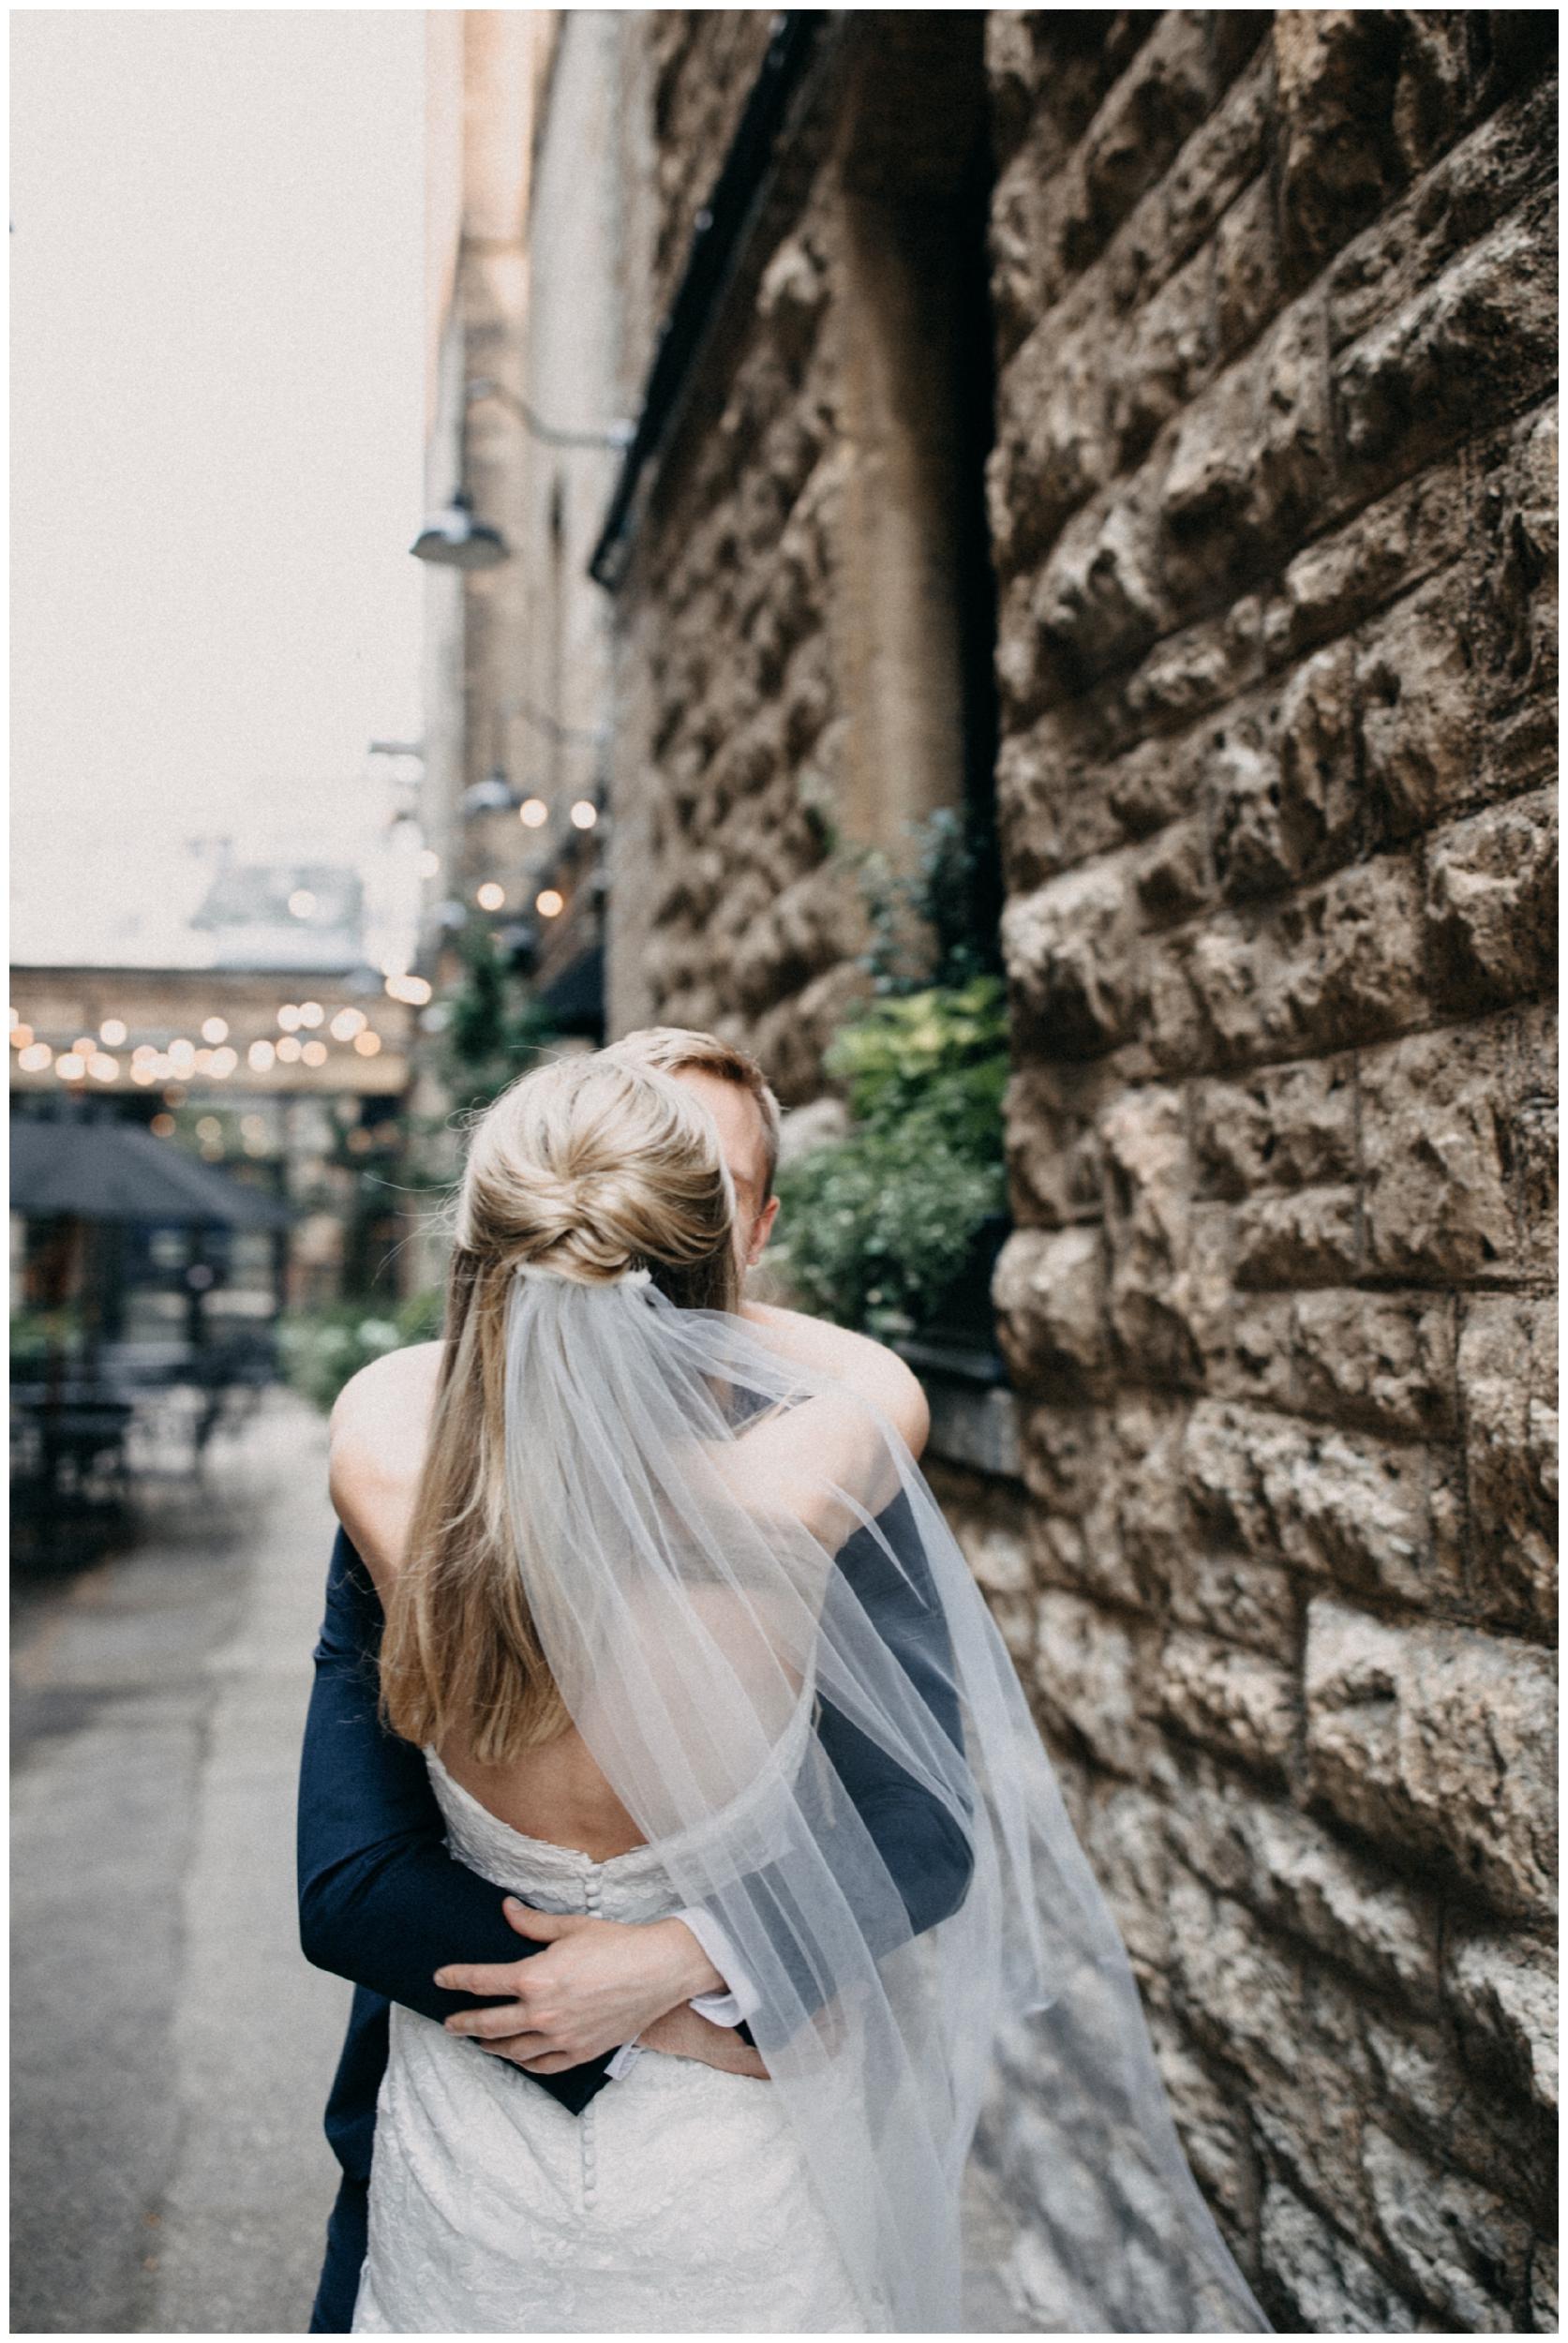 Minneapolis wedding photographed by Britt DeZeeuw